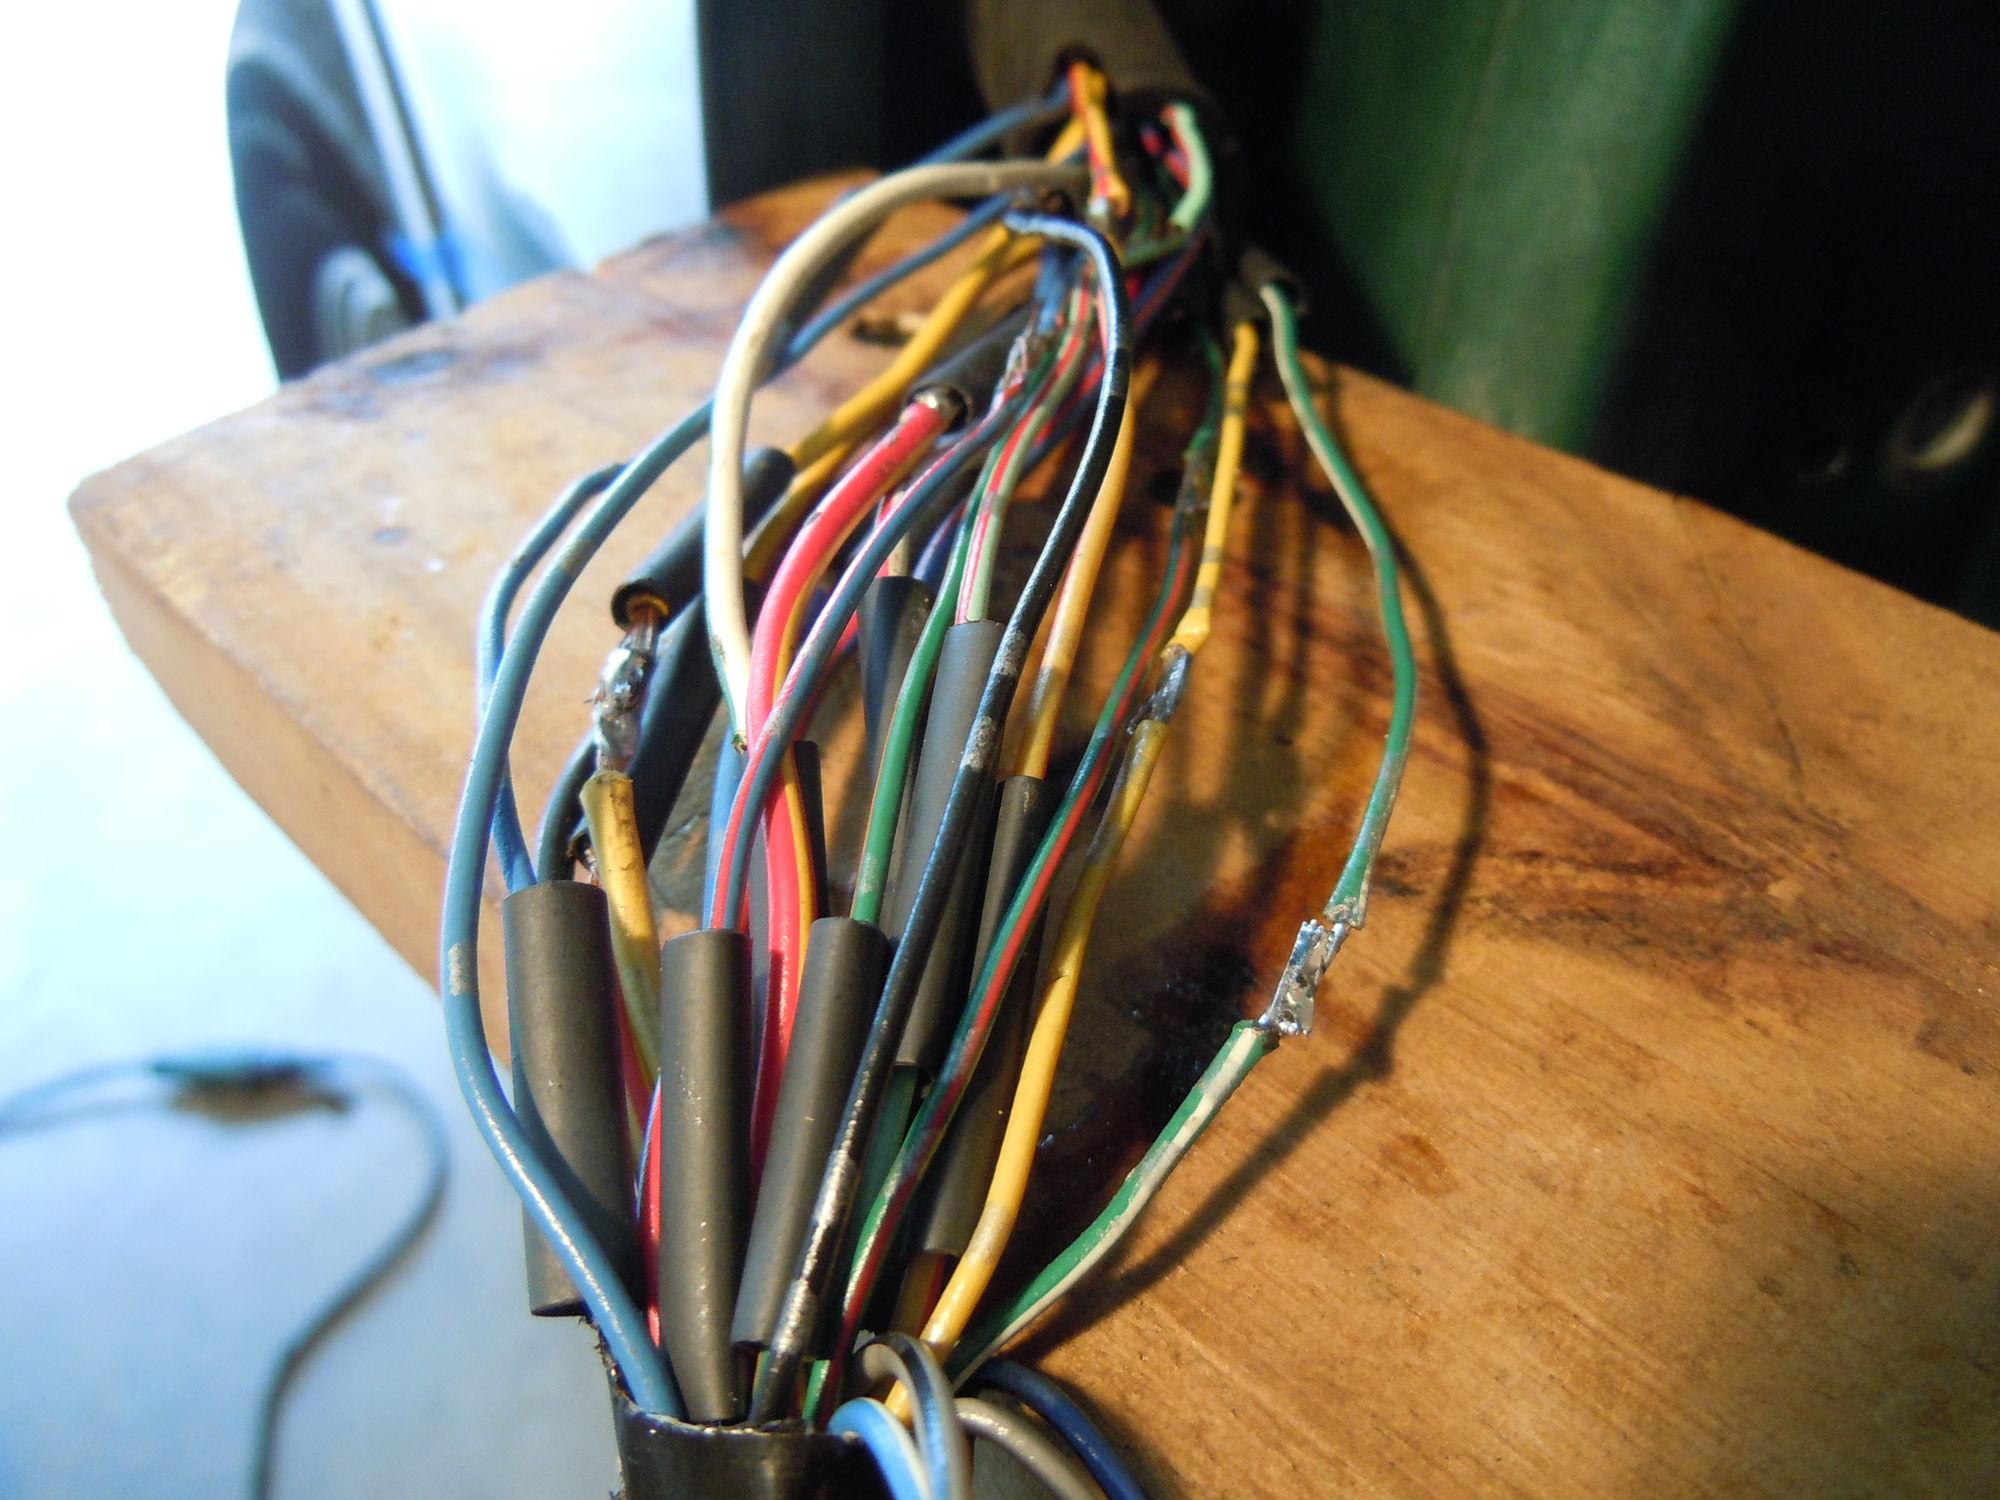 honda crv wiring diagram 1997 permanent magnet generator wiring, Wiring diagram